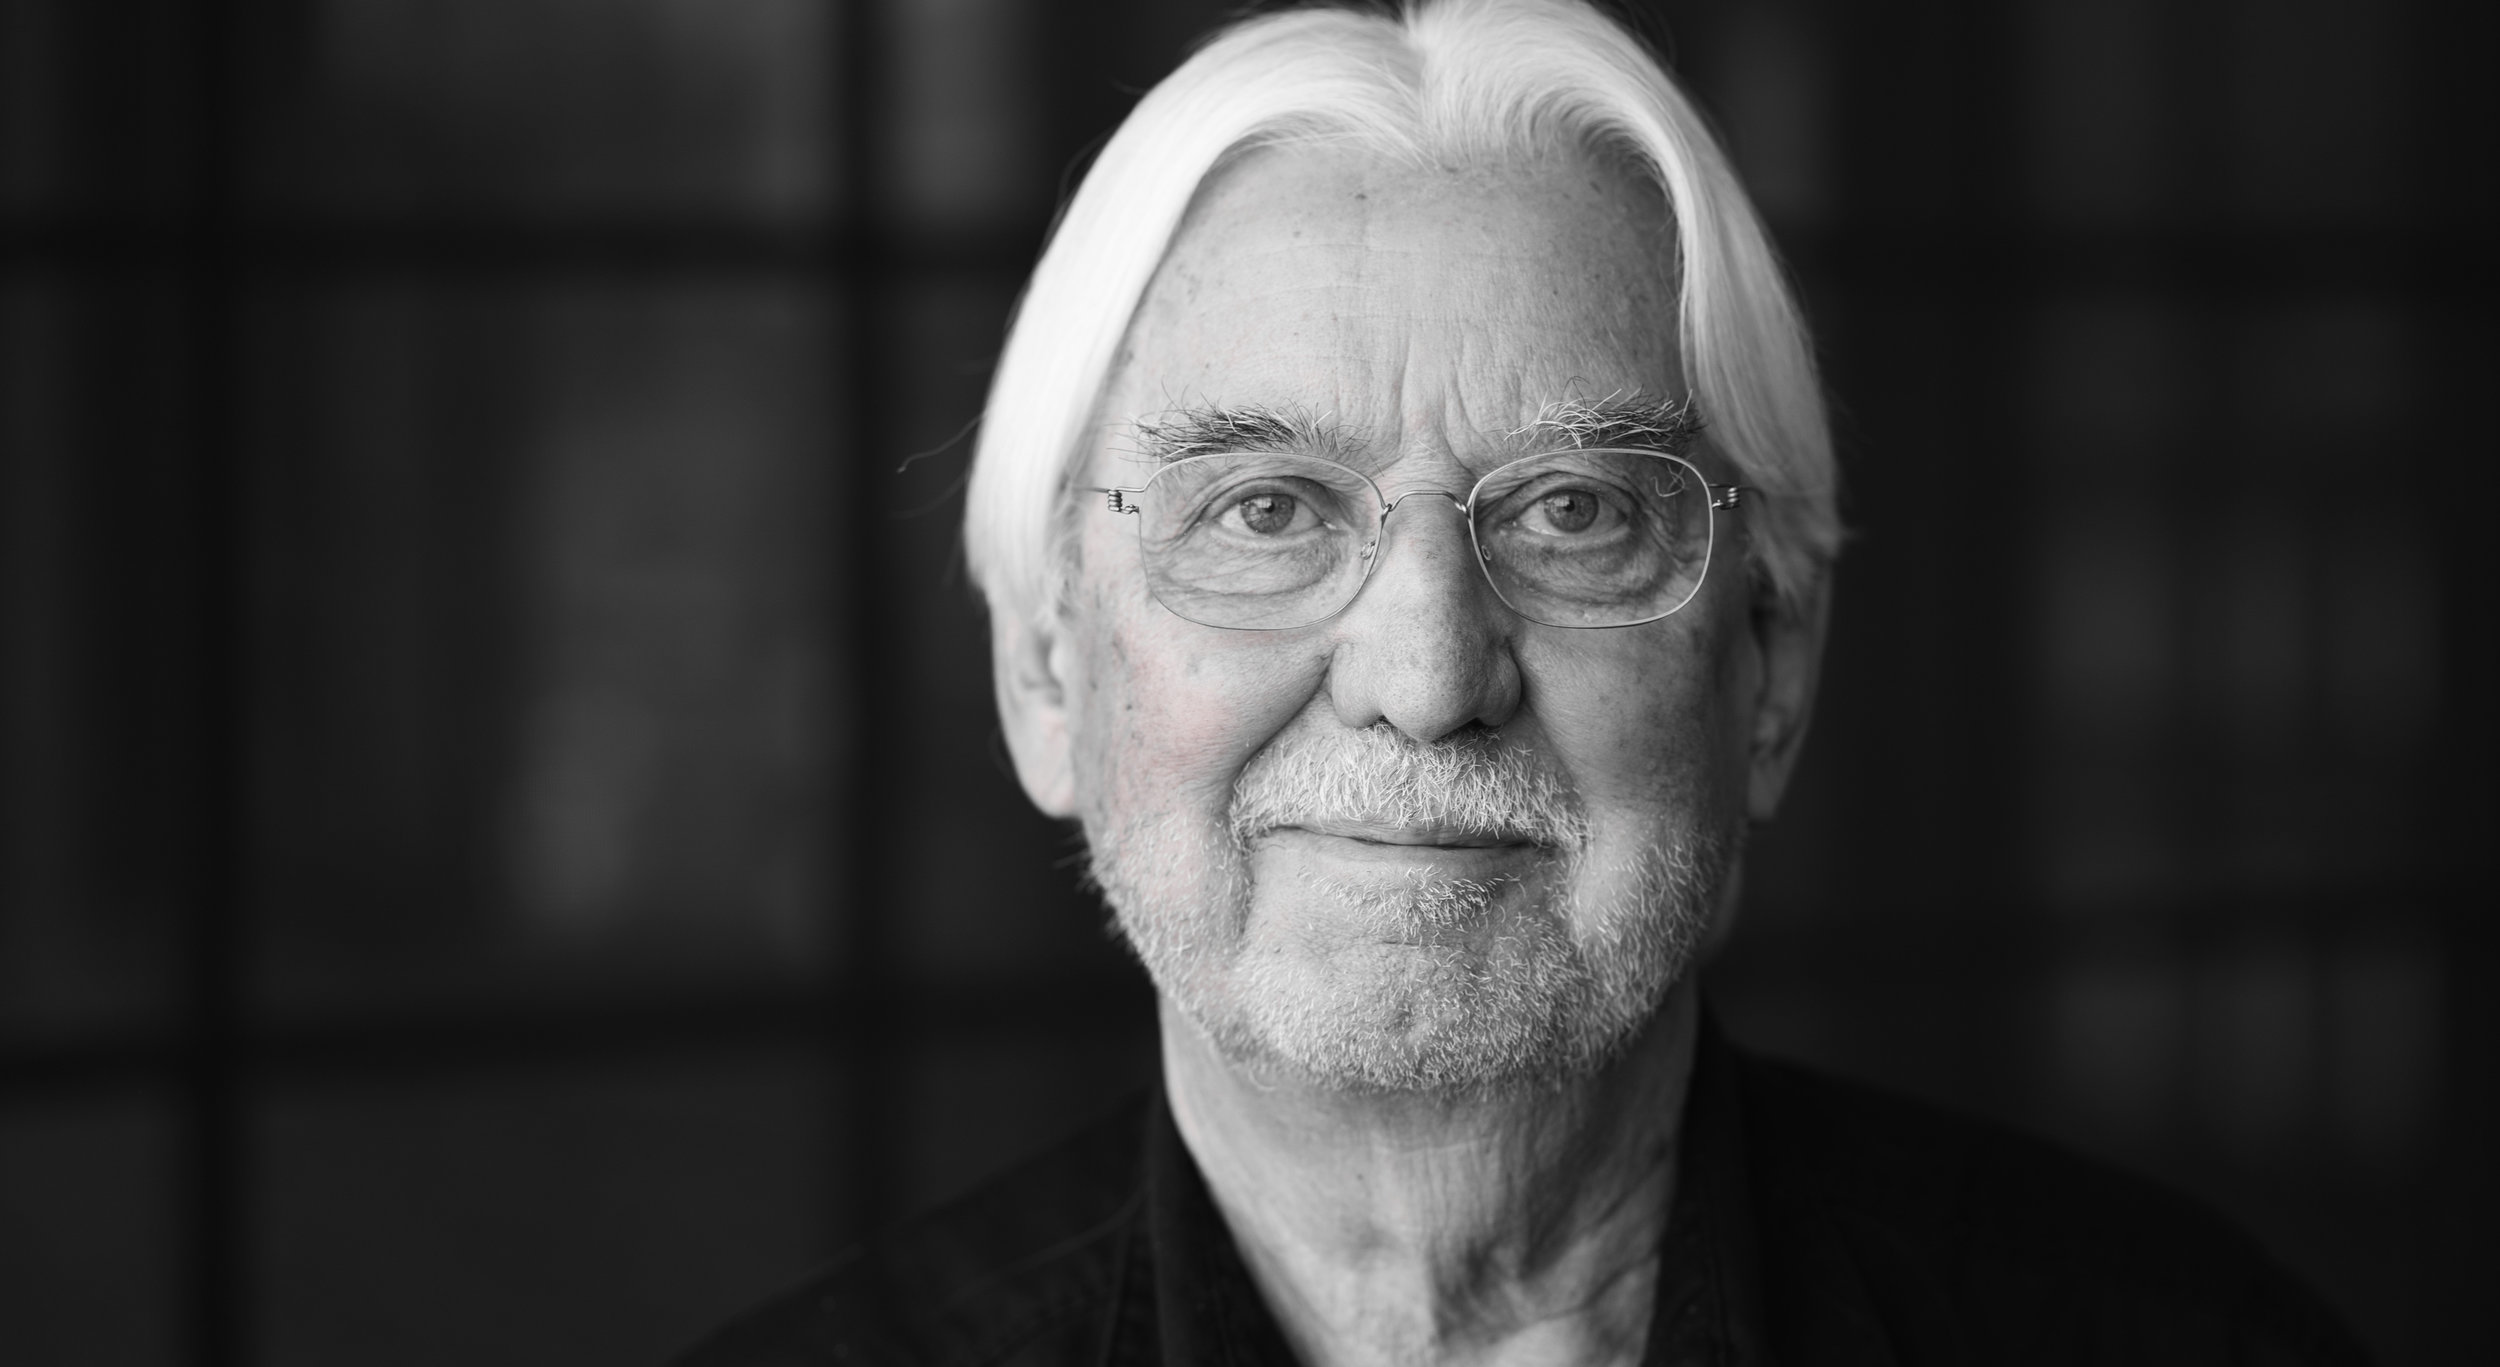 RIBA International Fellowship, 2019    The Royal Institute of British Architects (RIBA)  has awarded a  RIBA International Fellowship  to Director of Bridges, Architect Poul Ove Jensen.